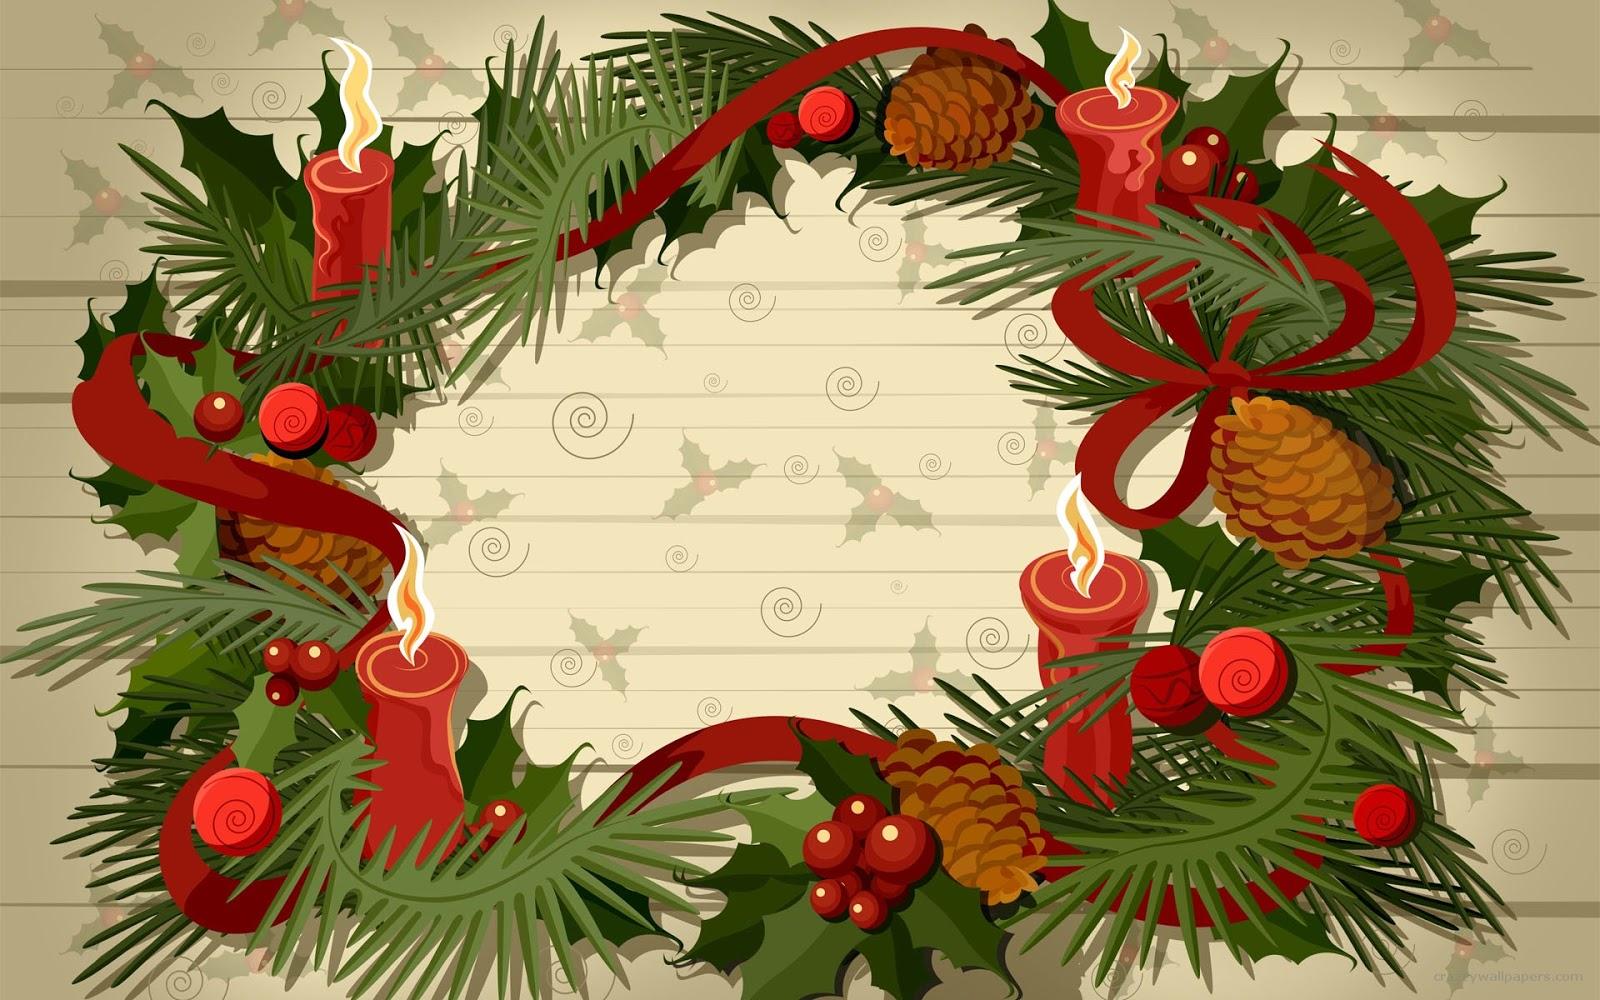 Top Wallpaper High Resolution Christmas - High-Resolution-merry-christmas-widescreen-wallpapers_free  Snapshot_667915.jpg